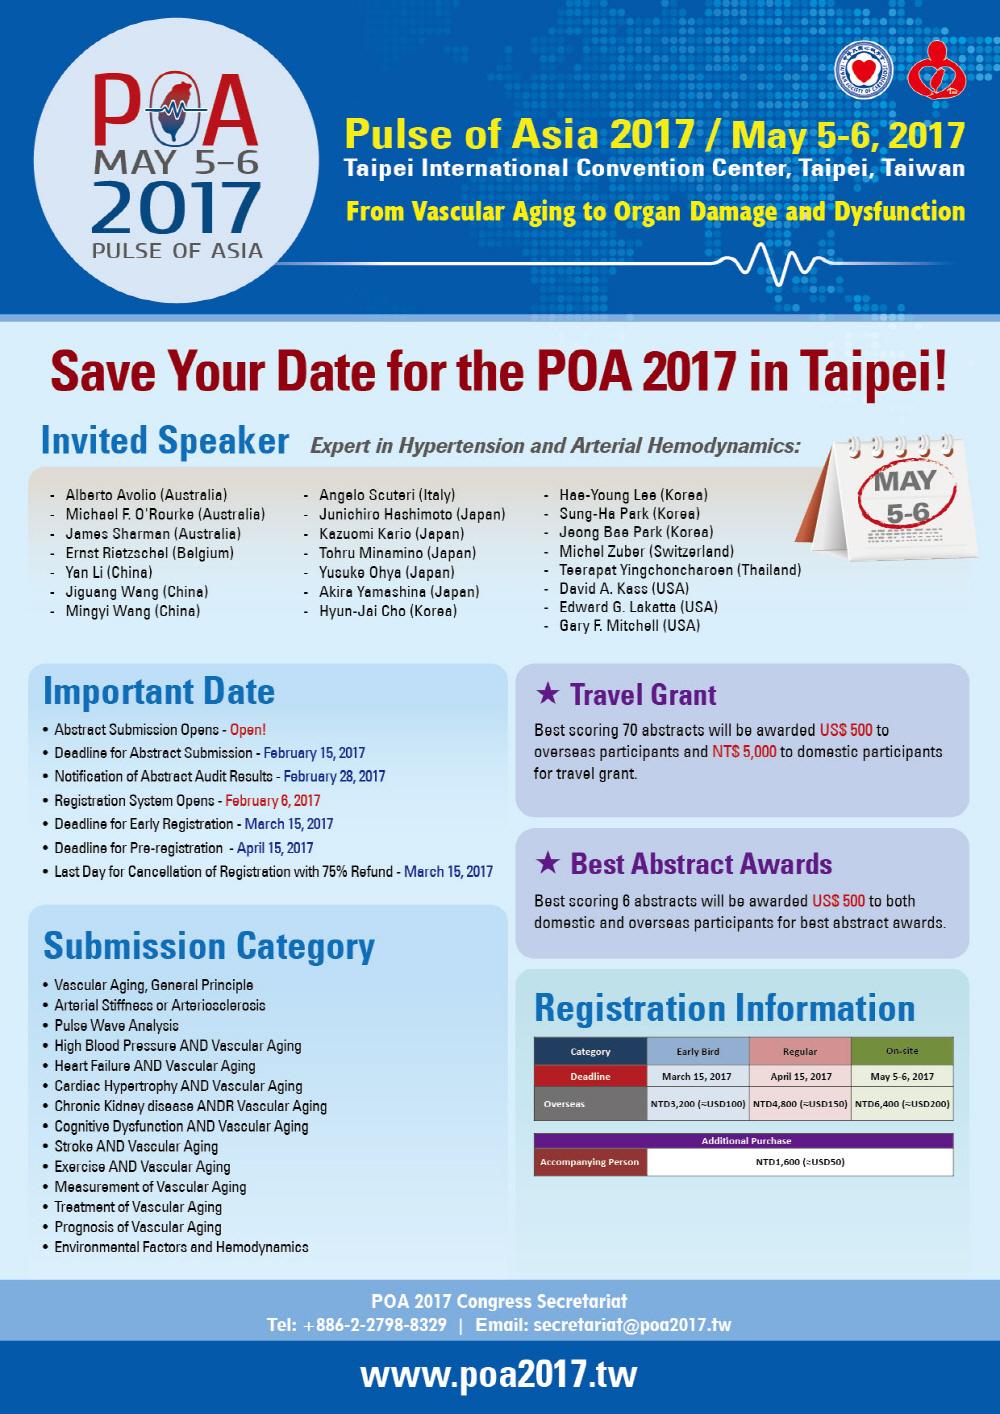 POA 2017 Promotion.jpg